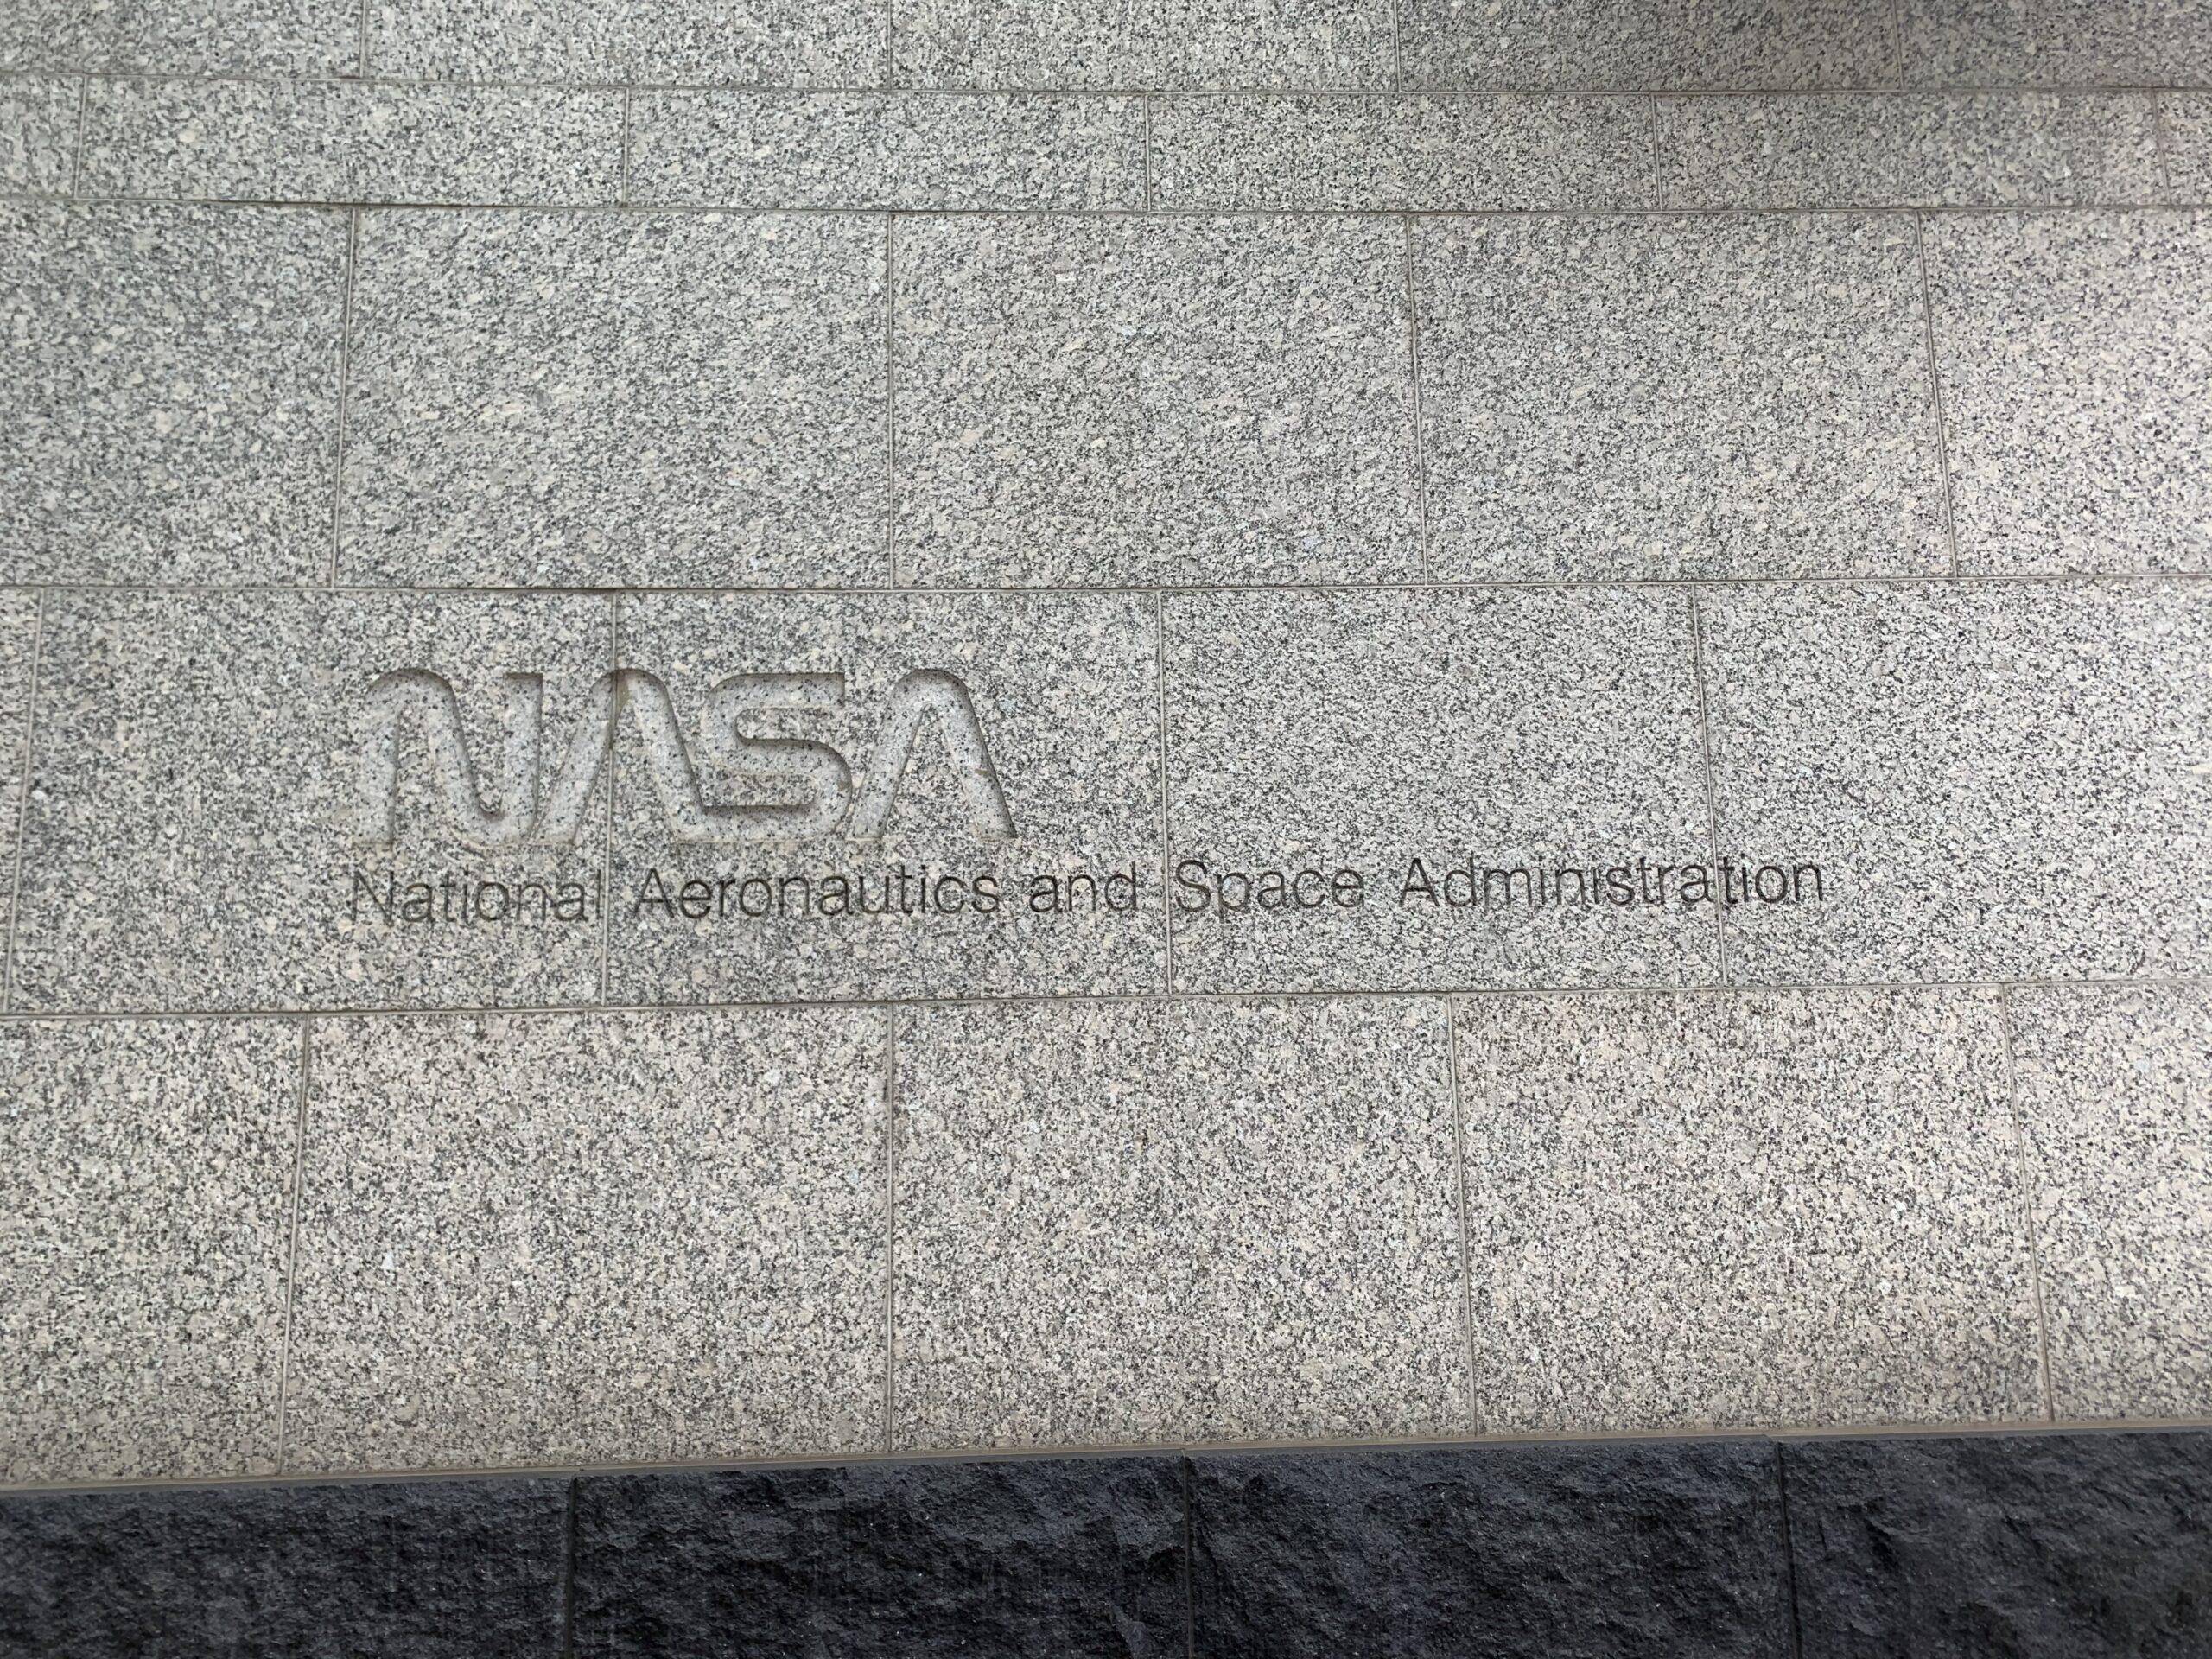 NASA visit, Jahn Research Group, Molly Jahn